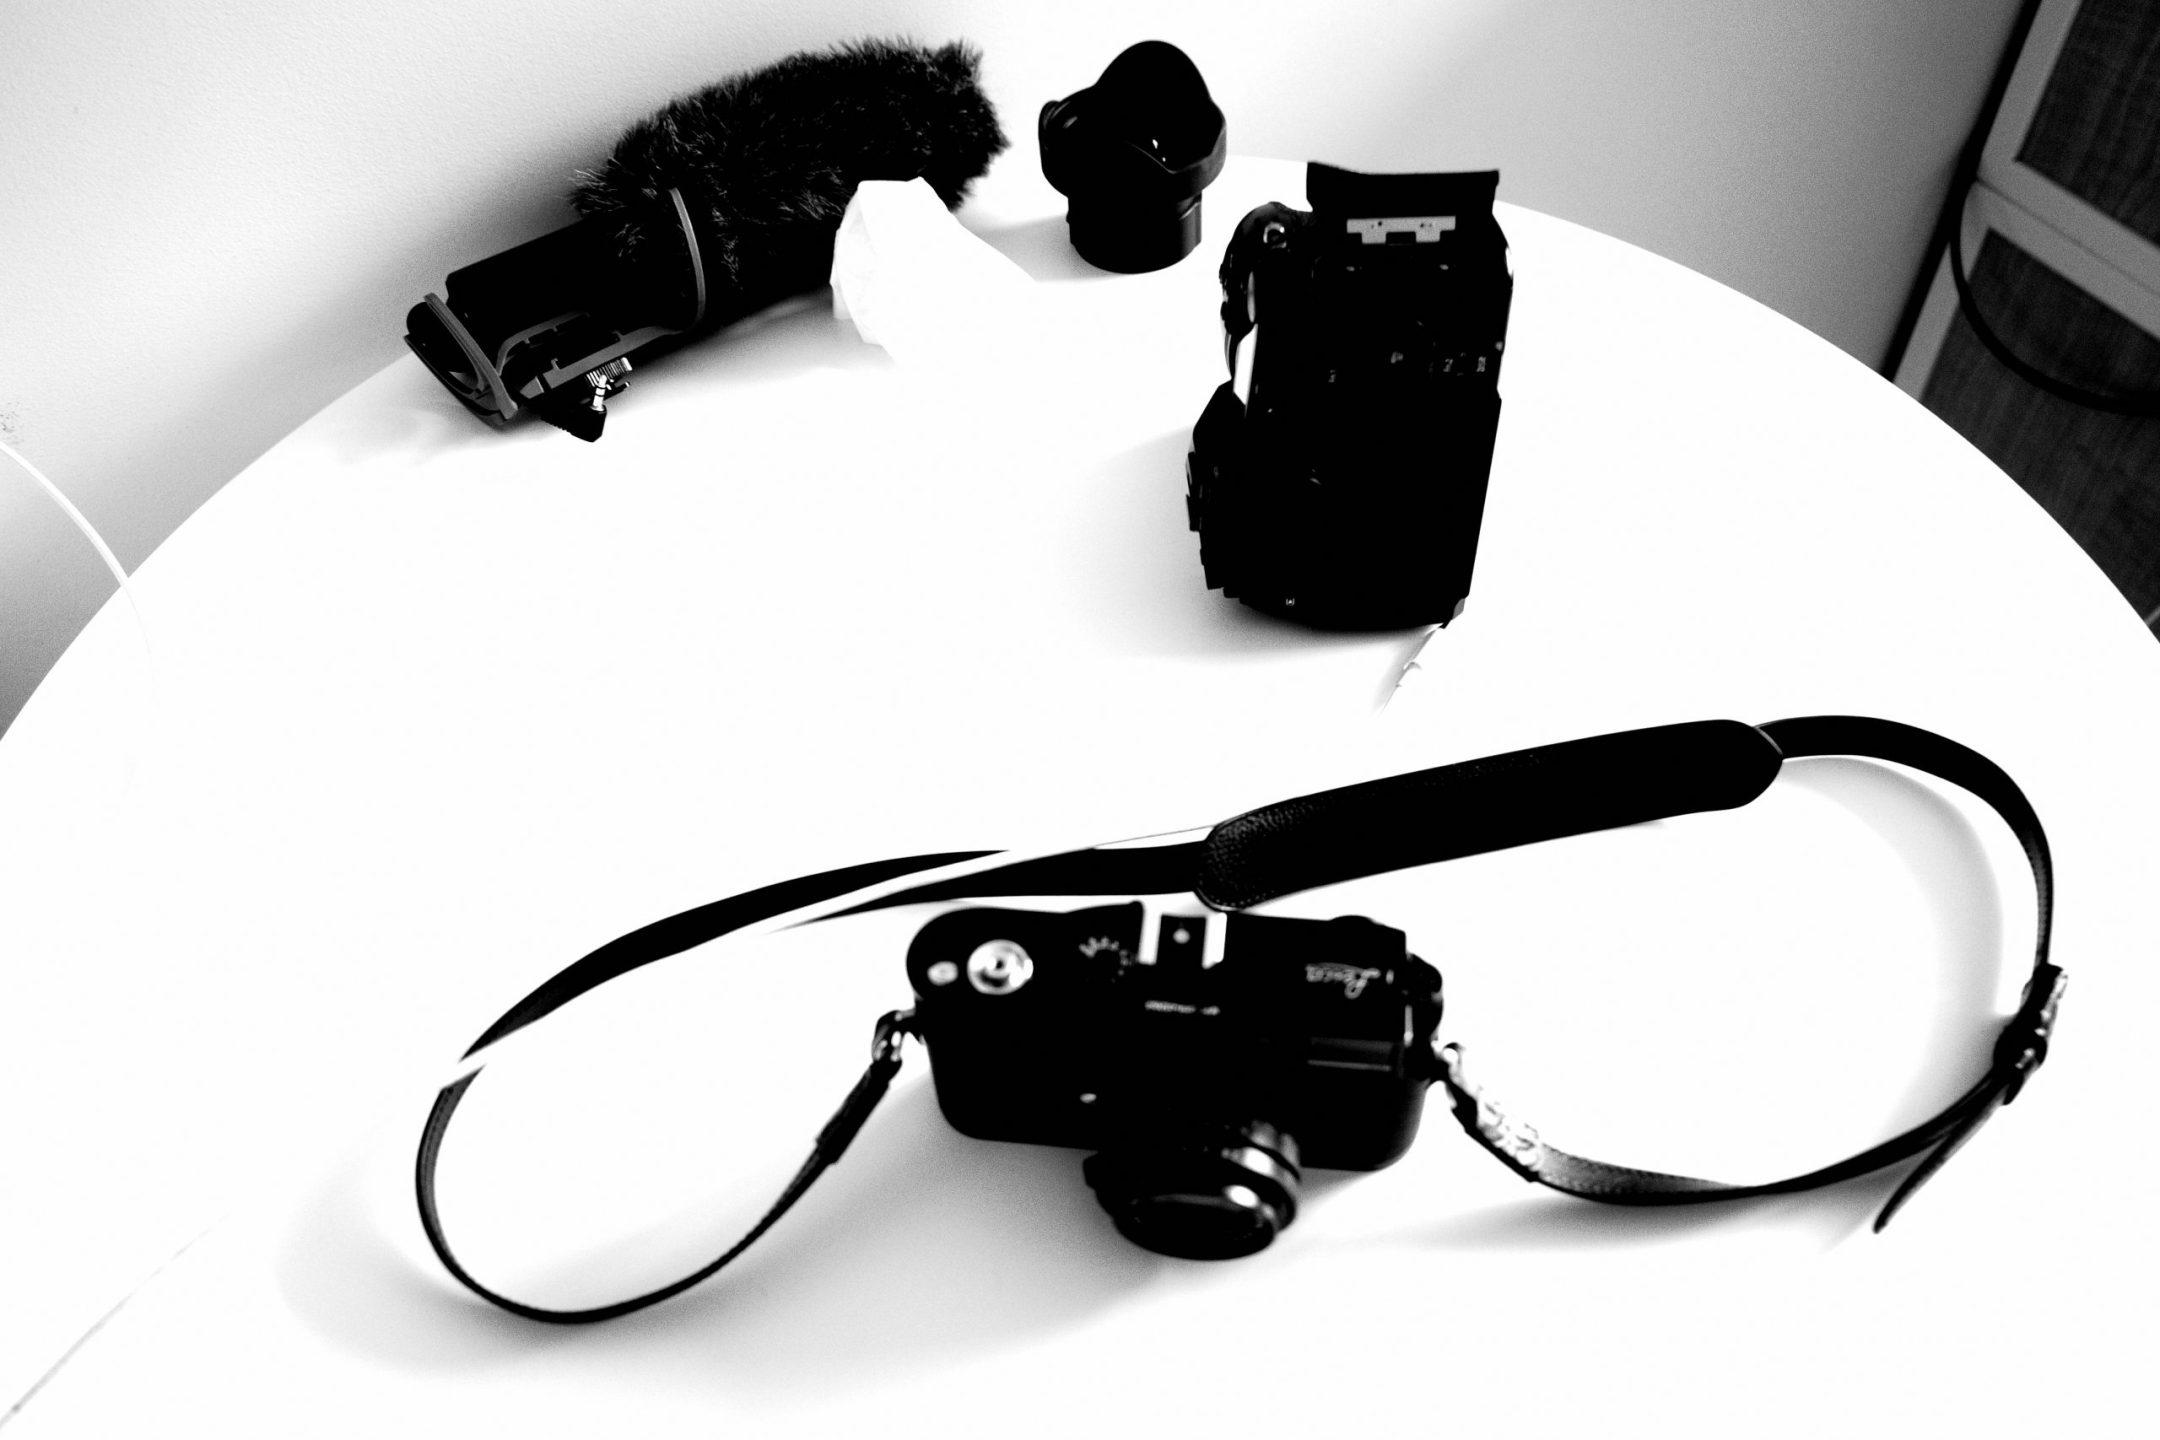 Leica MP, Lumix G9, RICOH GR III